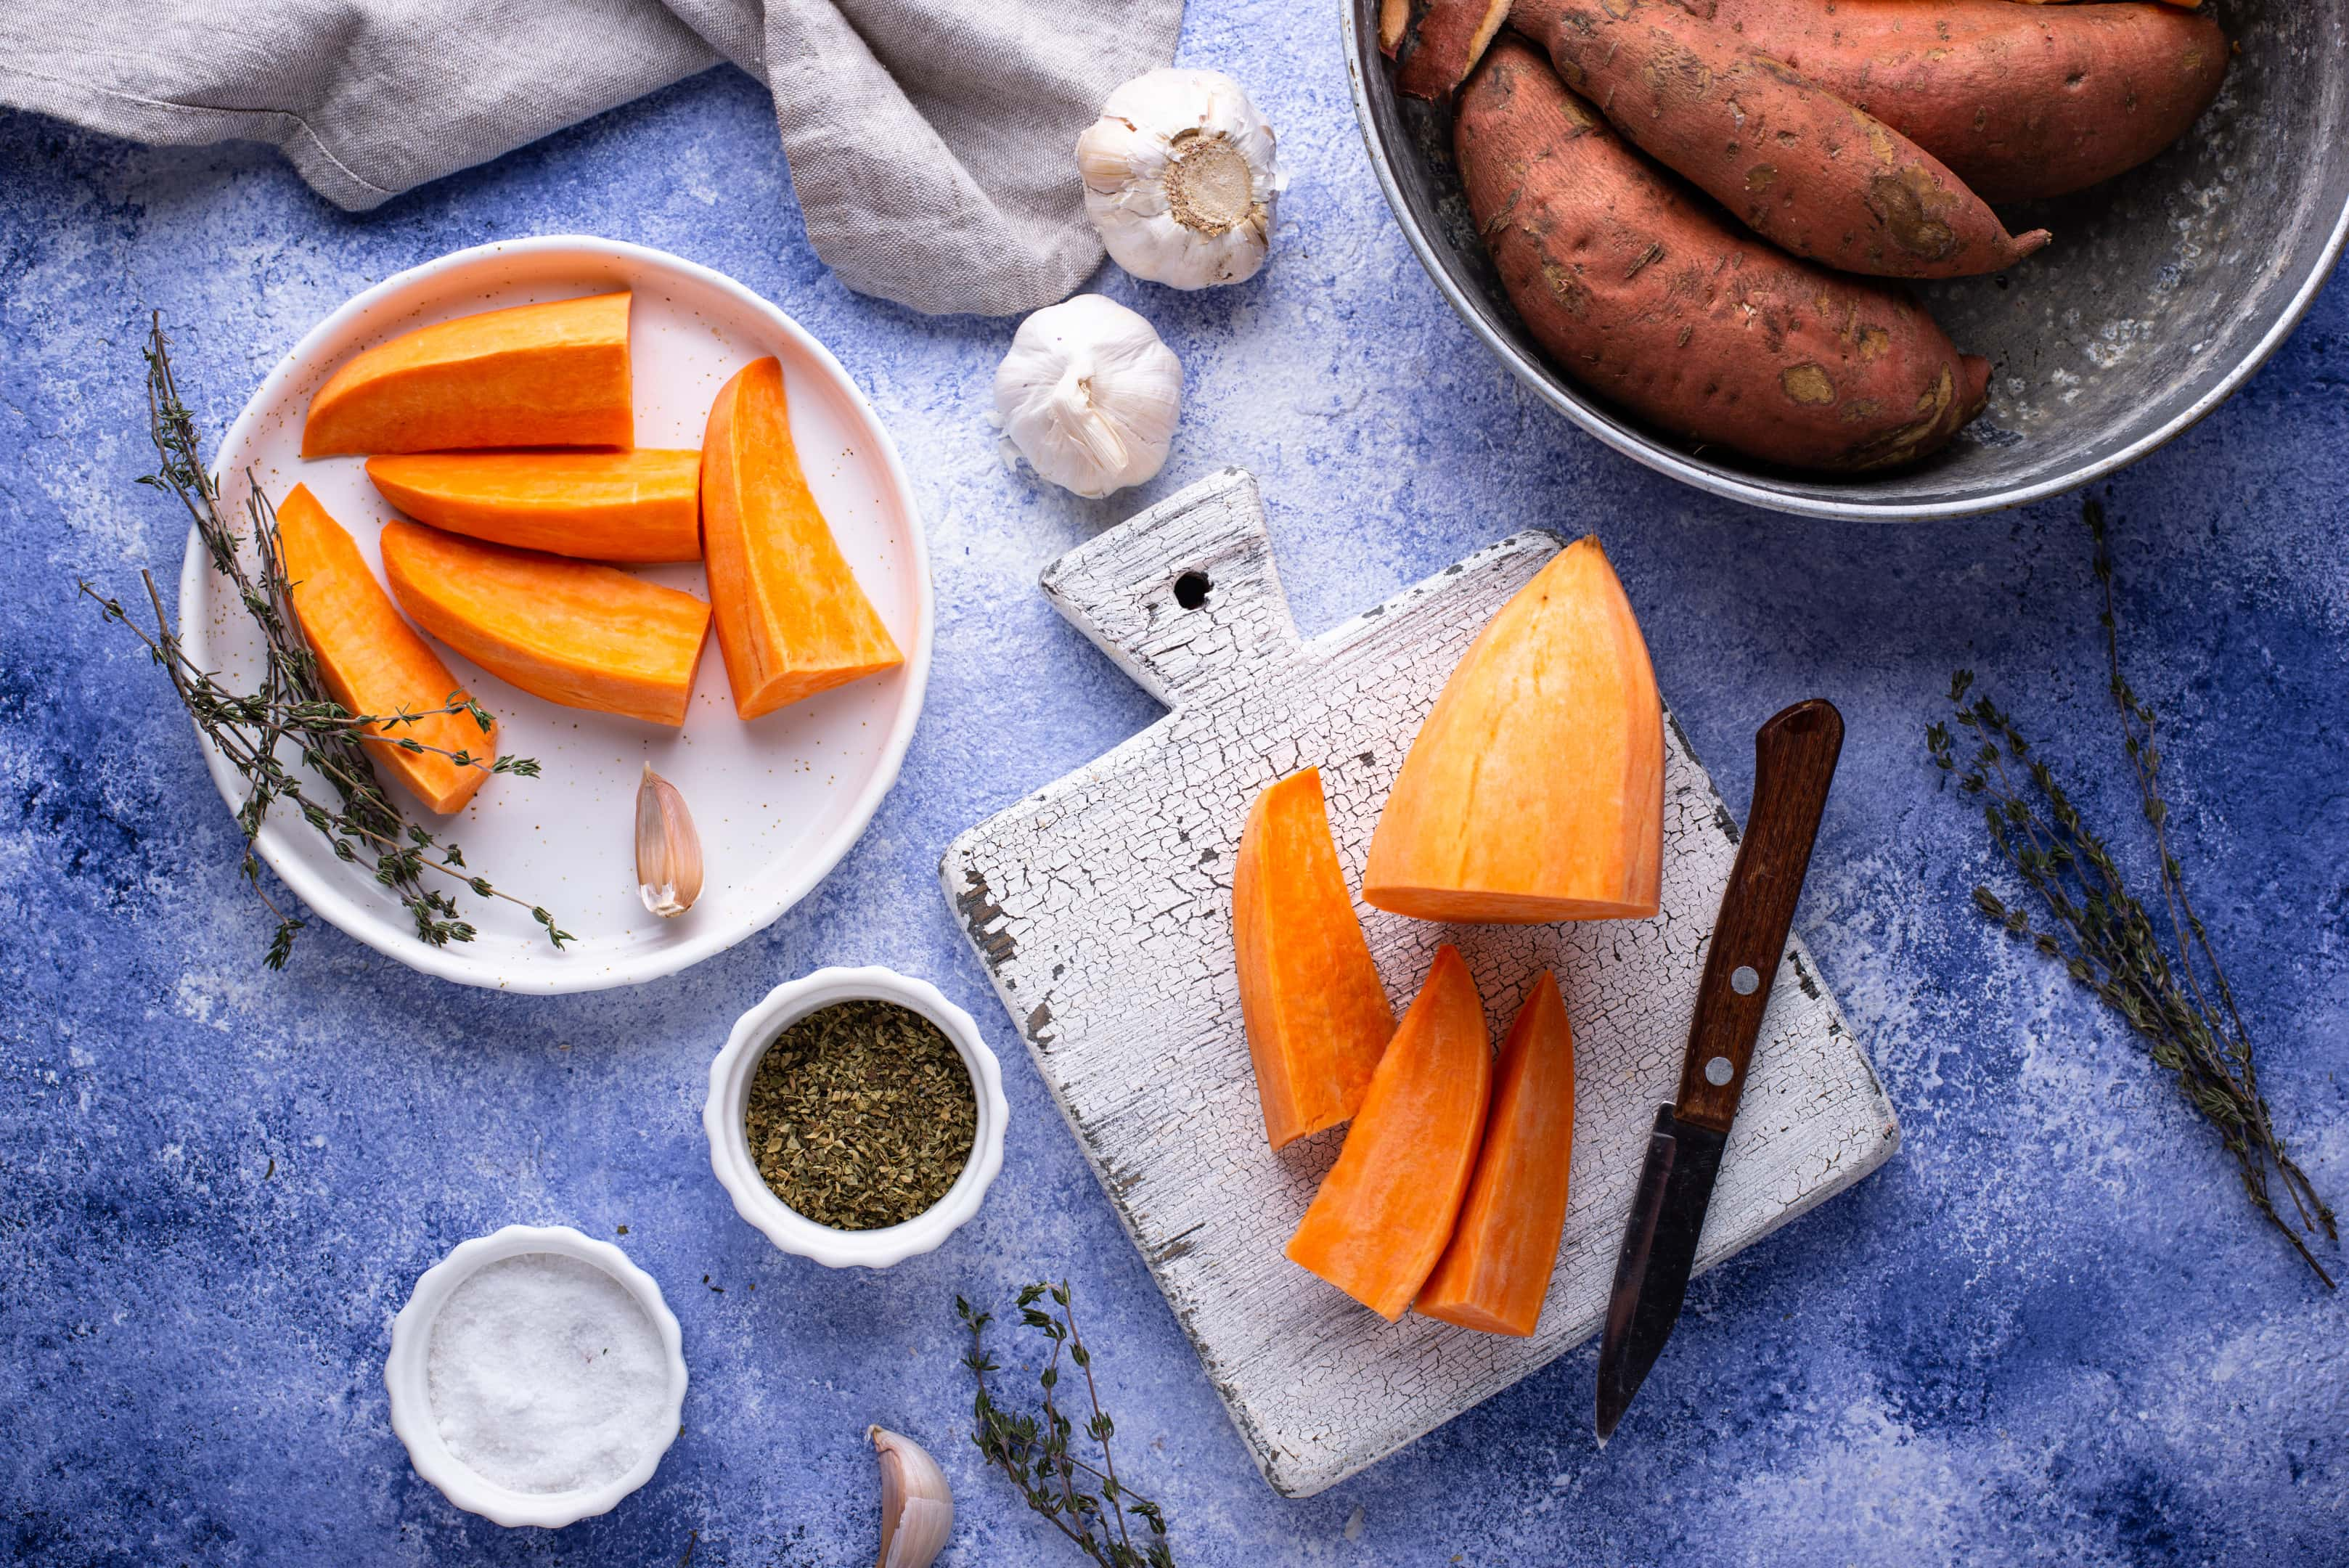 Raw sweet potato with herbs garlic